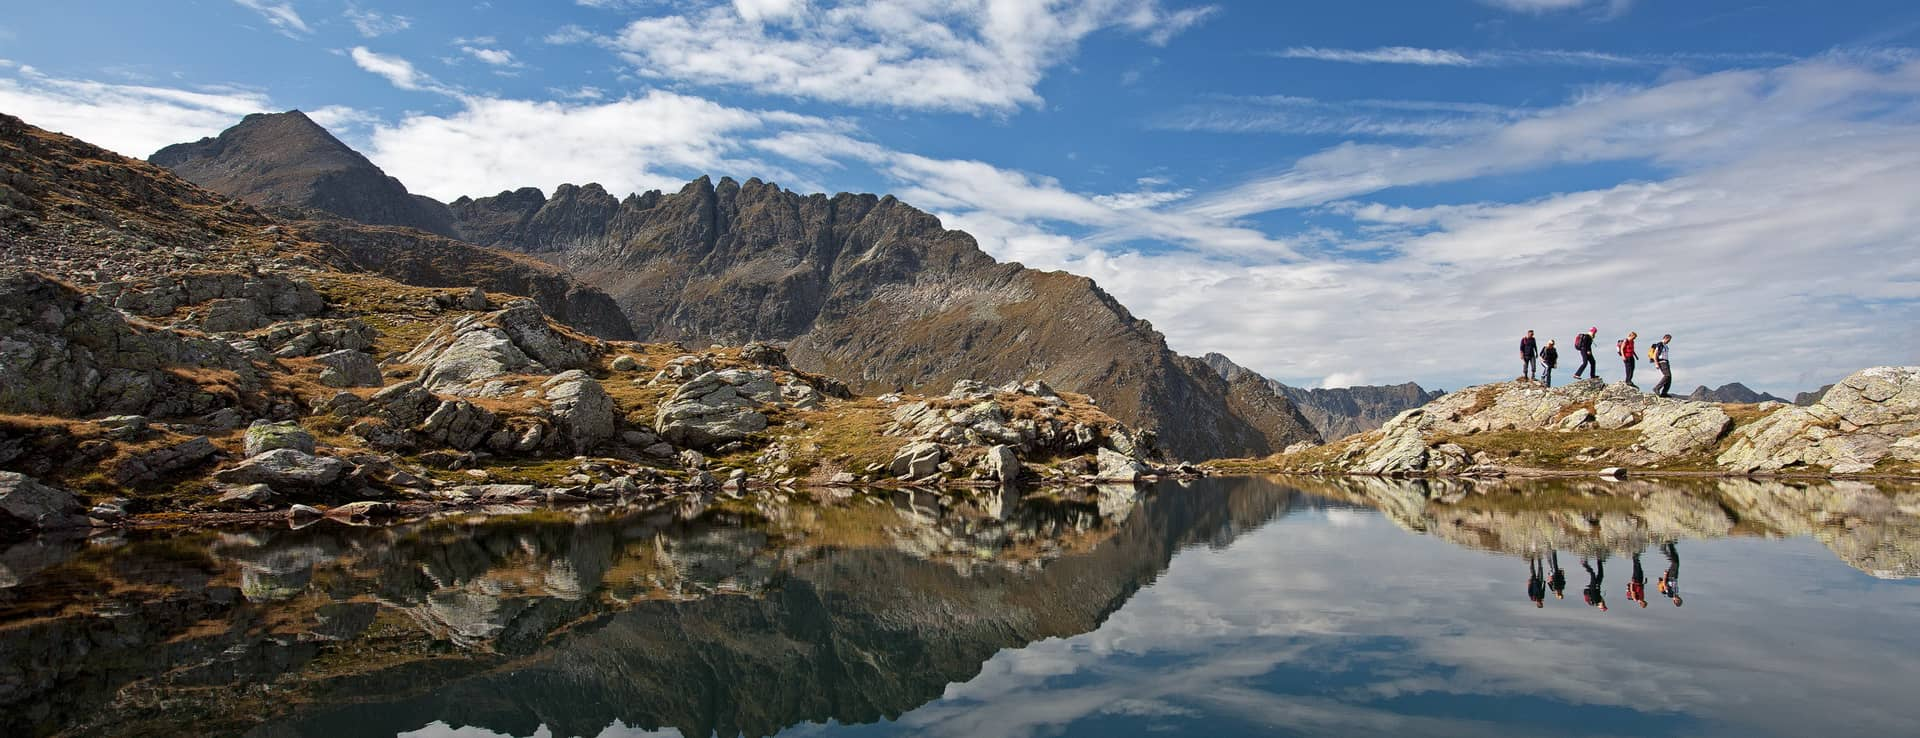 Klafferkessel - Schladming Tauern Höhenweg - resor Österrike med Austria Travel